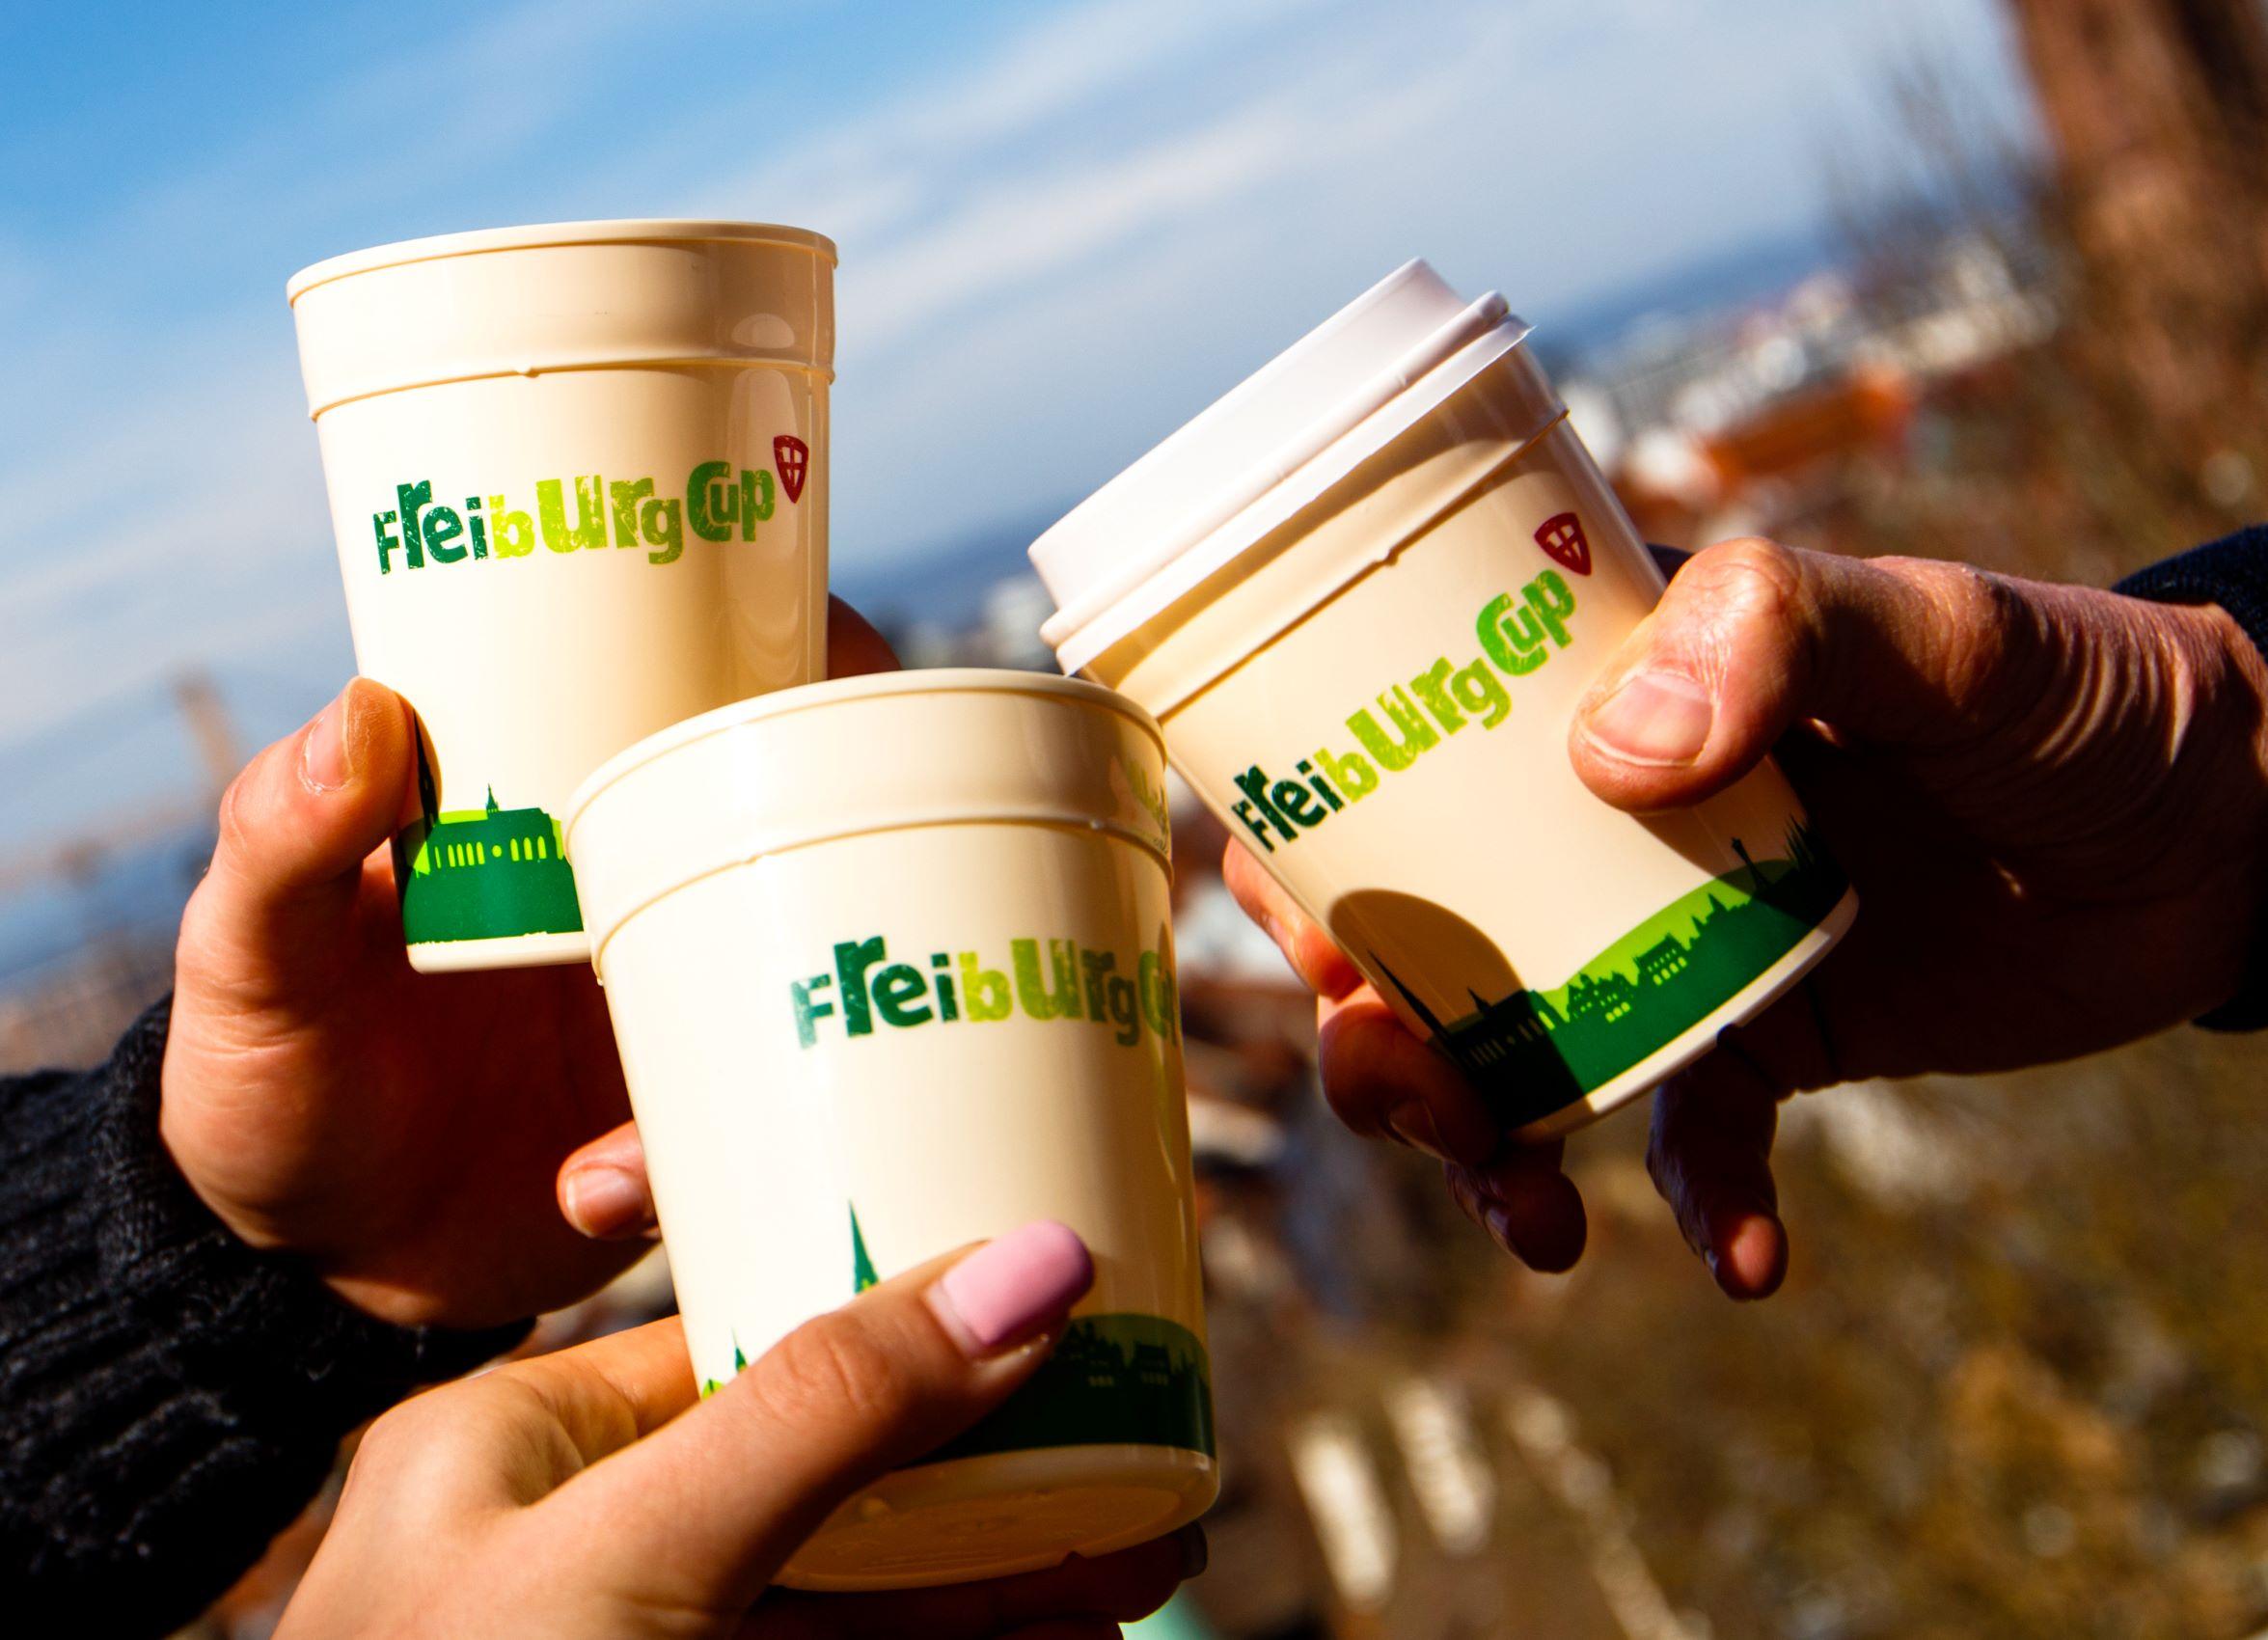 Meet The Freiburgcup Paving The Way For Zero Waste Coffee